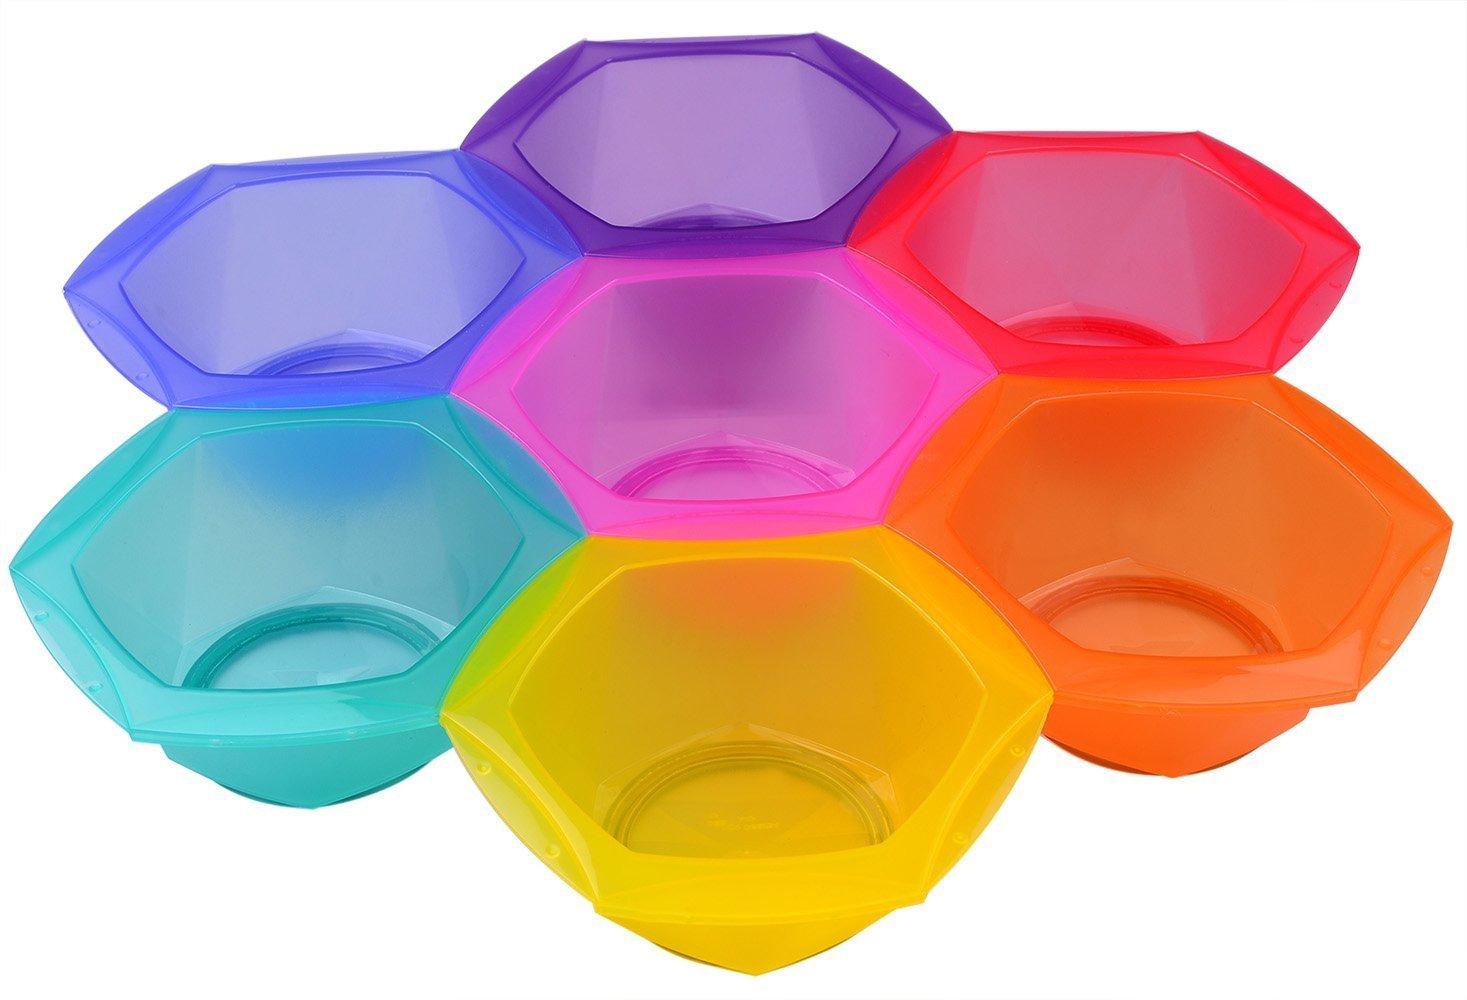 Hair Dye Mixing Bowl Kit, Professional Tint Coloring Bowls Tools Set in Rainbow Colors Perfehair TB021